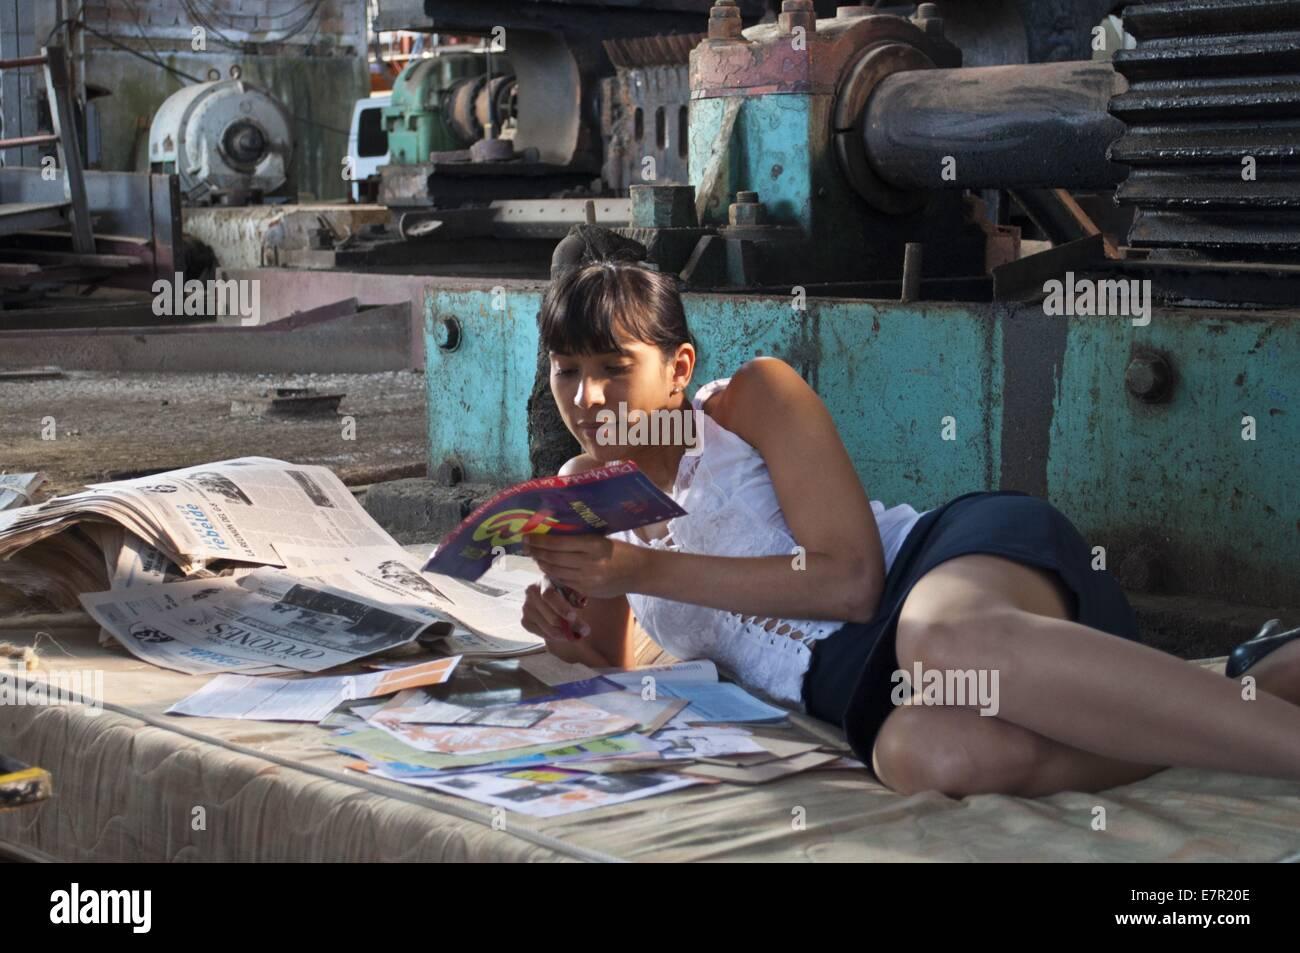 Melaza Anno : 2012 Cuba Direttore : Carlos Lechuga Yuliet Cruz Immagini Stock